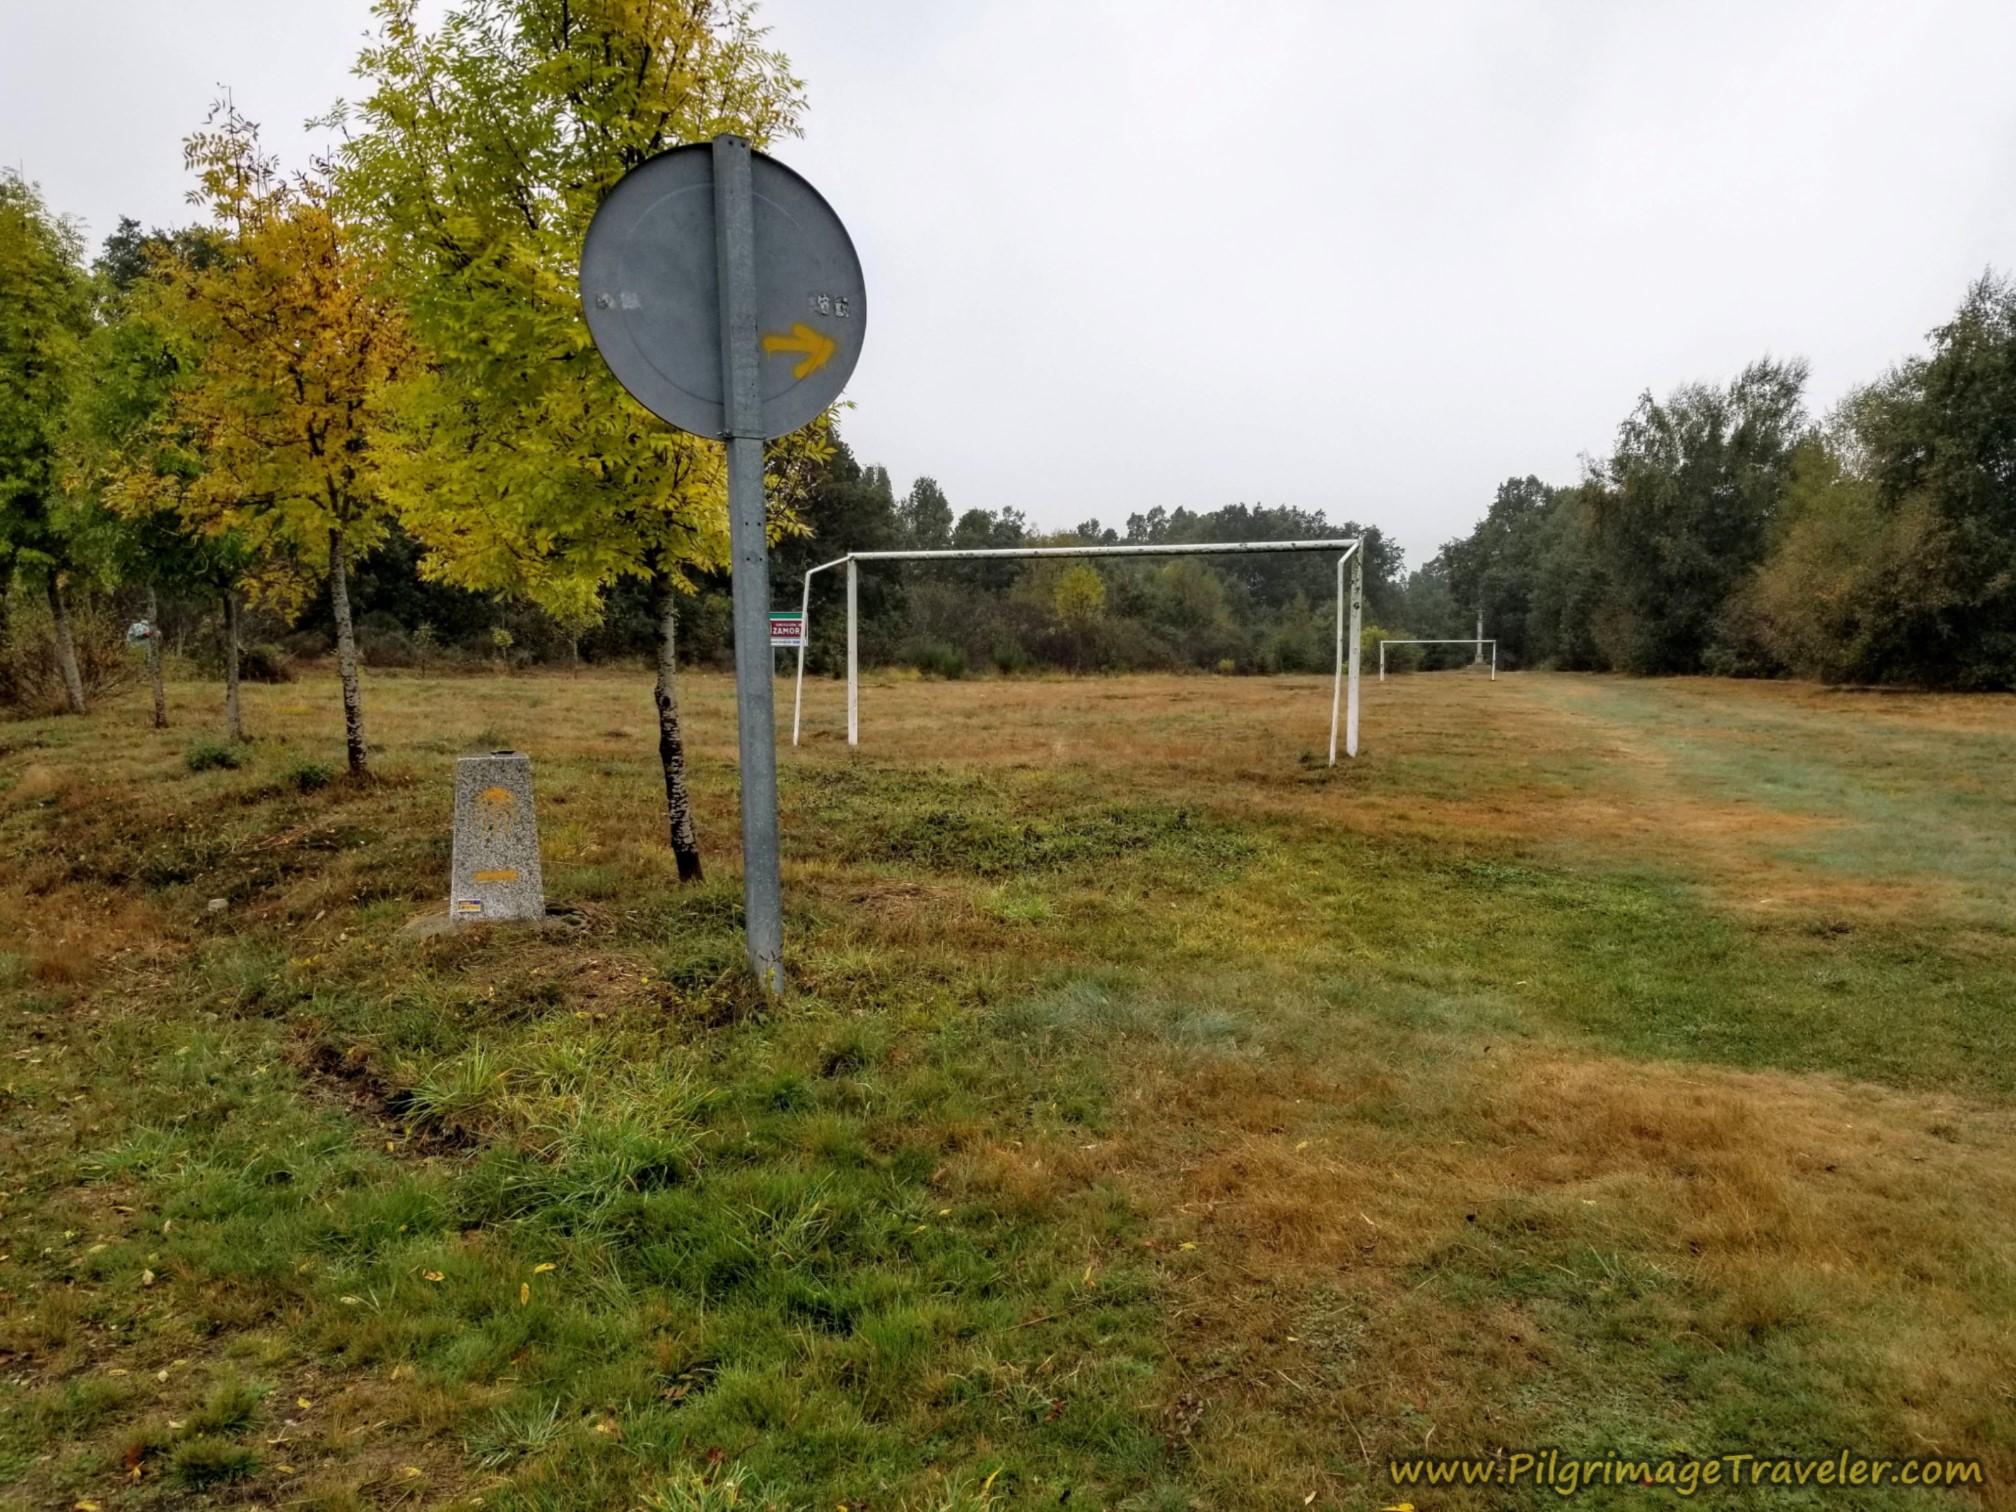 Right Turn at Soccer Field